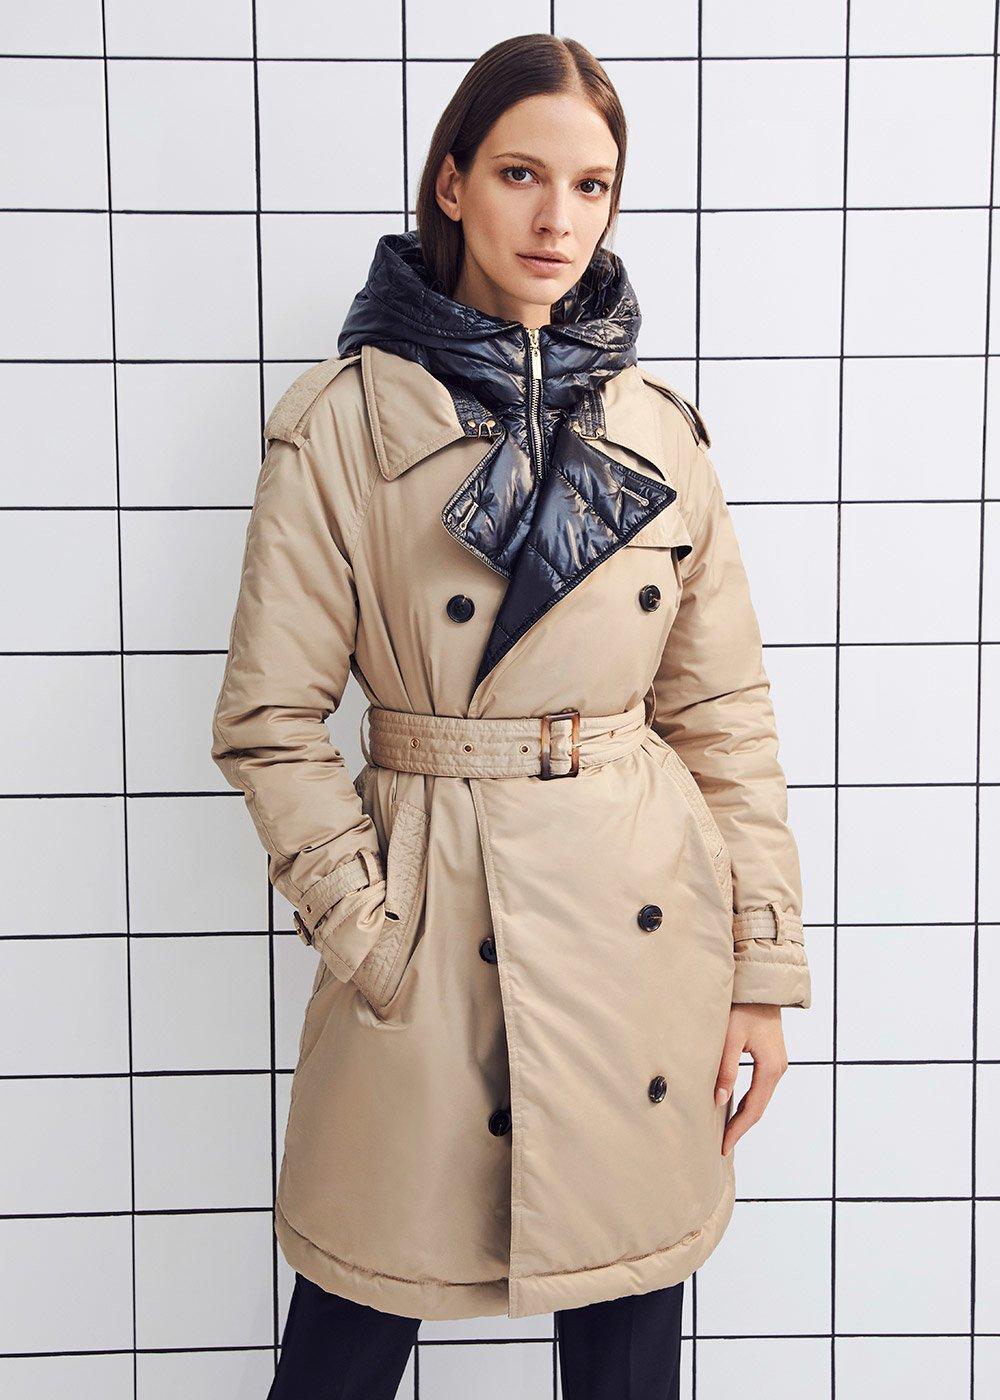 Paryl trench coat-model down jacket - Safari - Woman